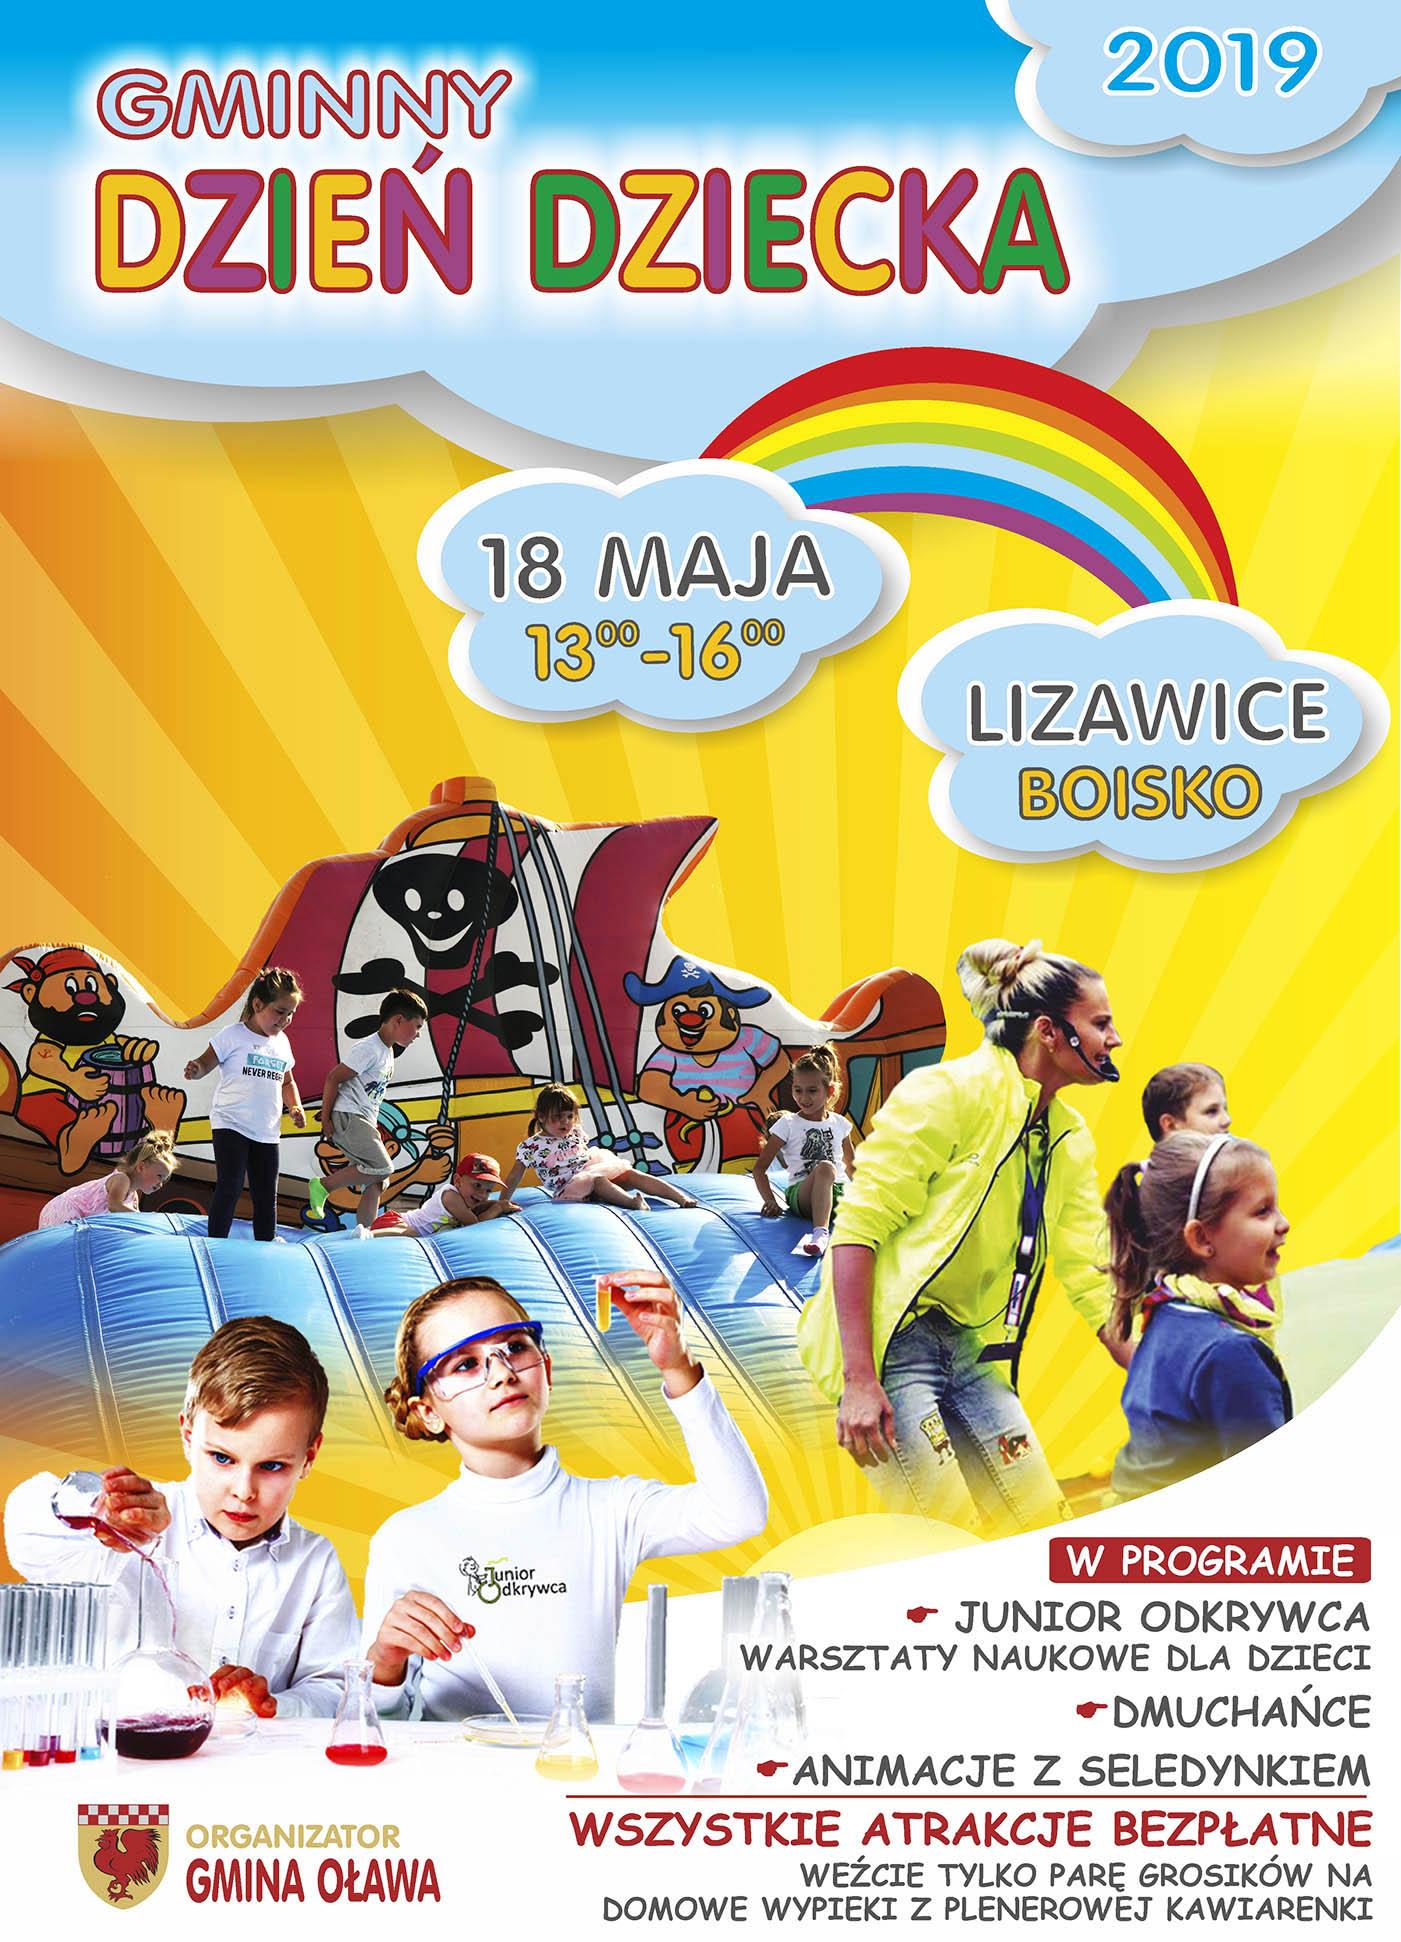 Gminny Dzien Dziecka 18 Maja Lizawice Gmina Olawa